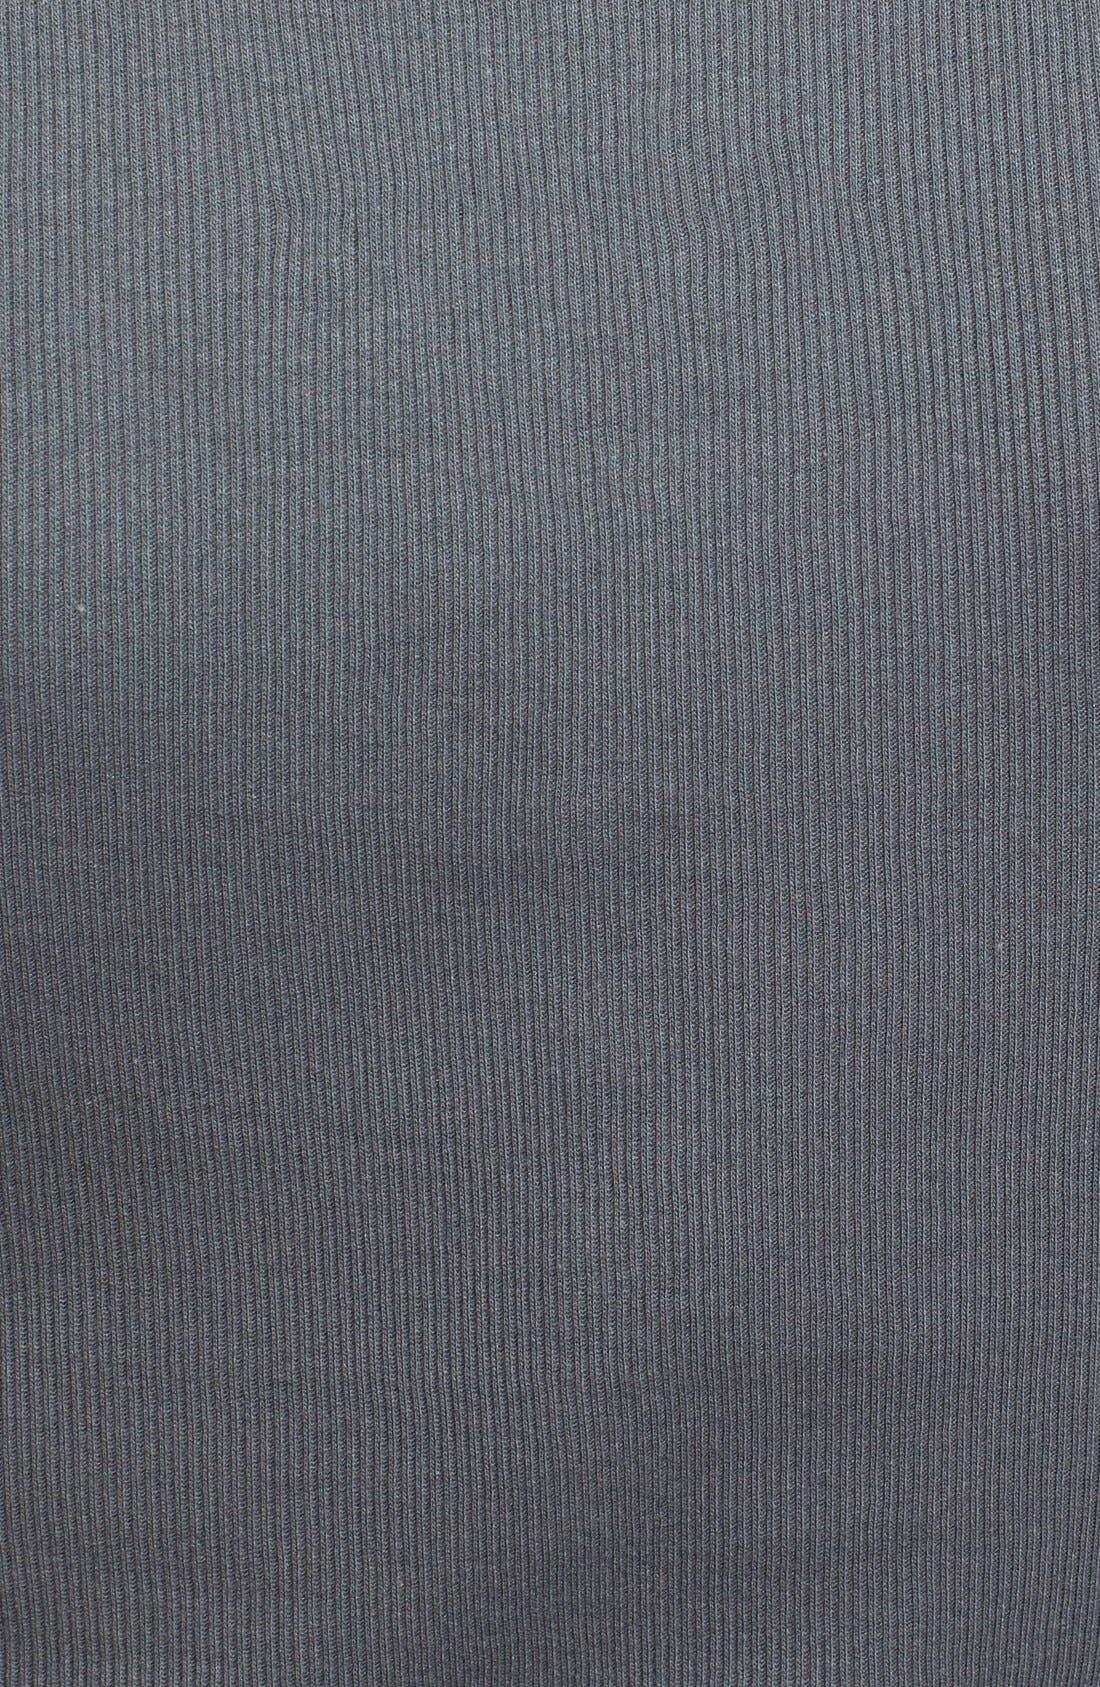 Alternate Image 3  - PJ Salvage 'Fancy That' Tank